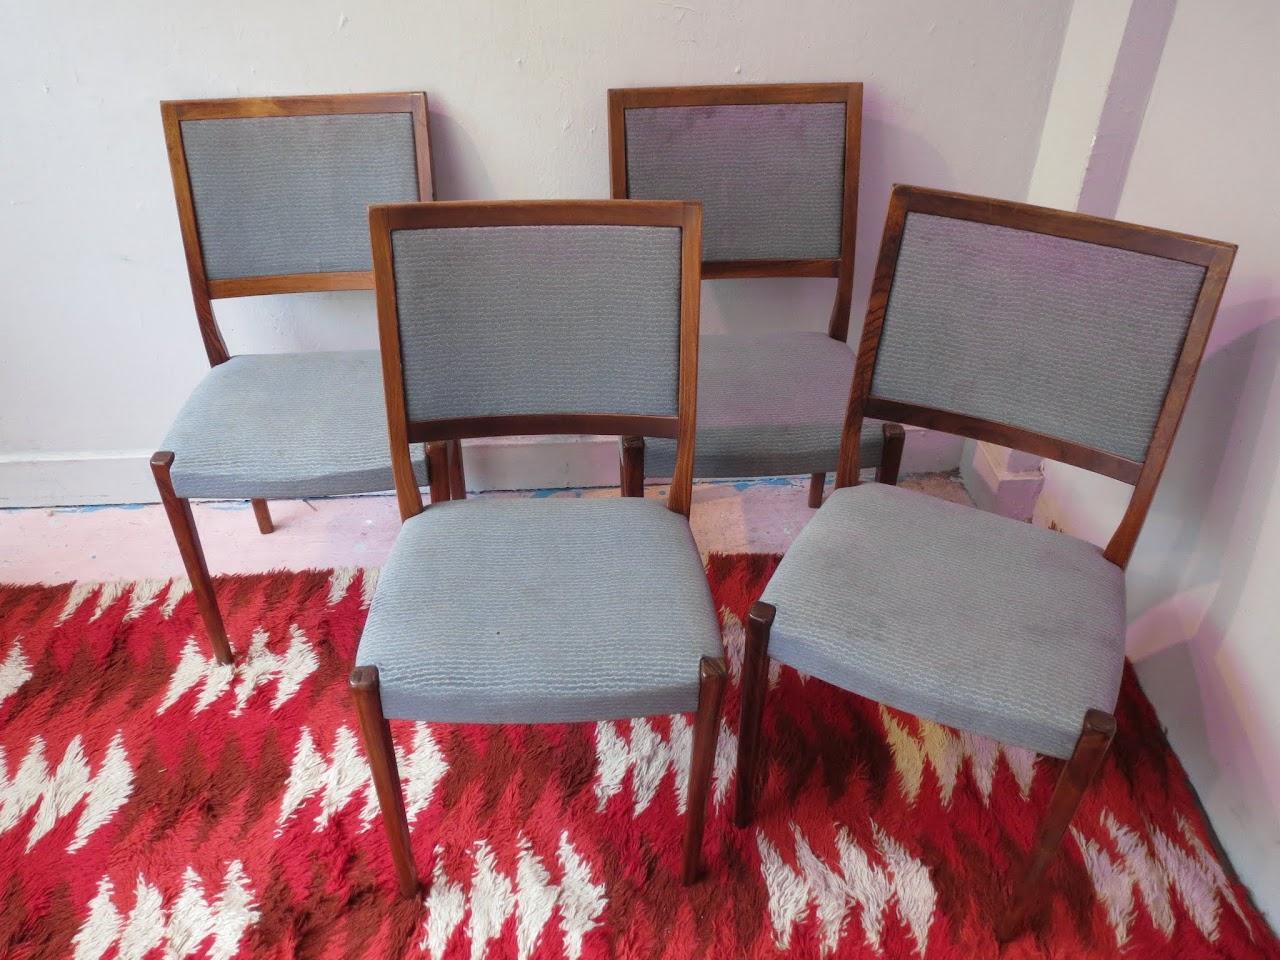 Svegards Dining Chair Set